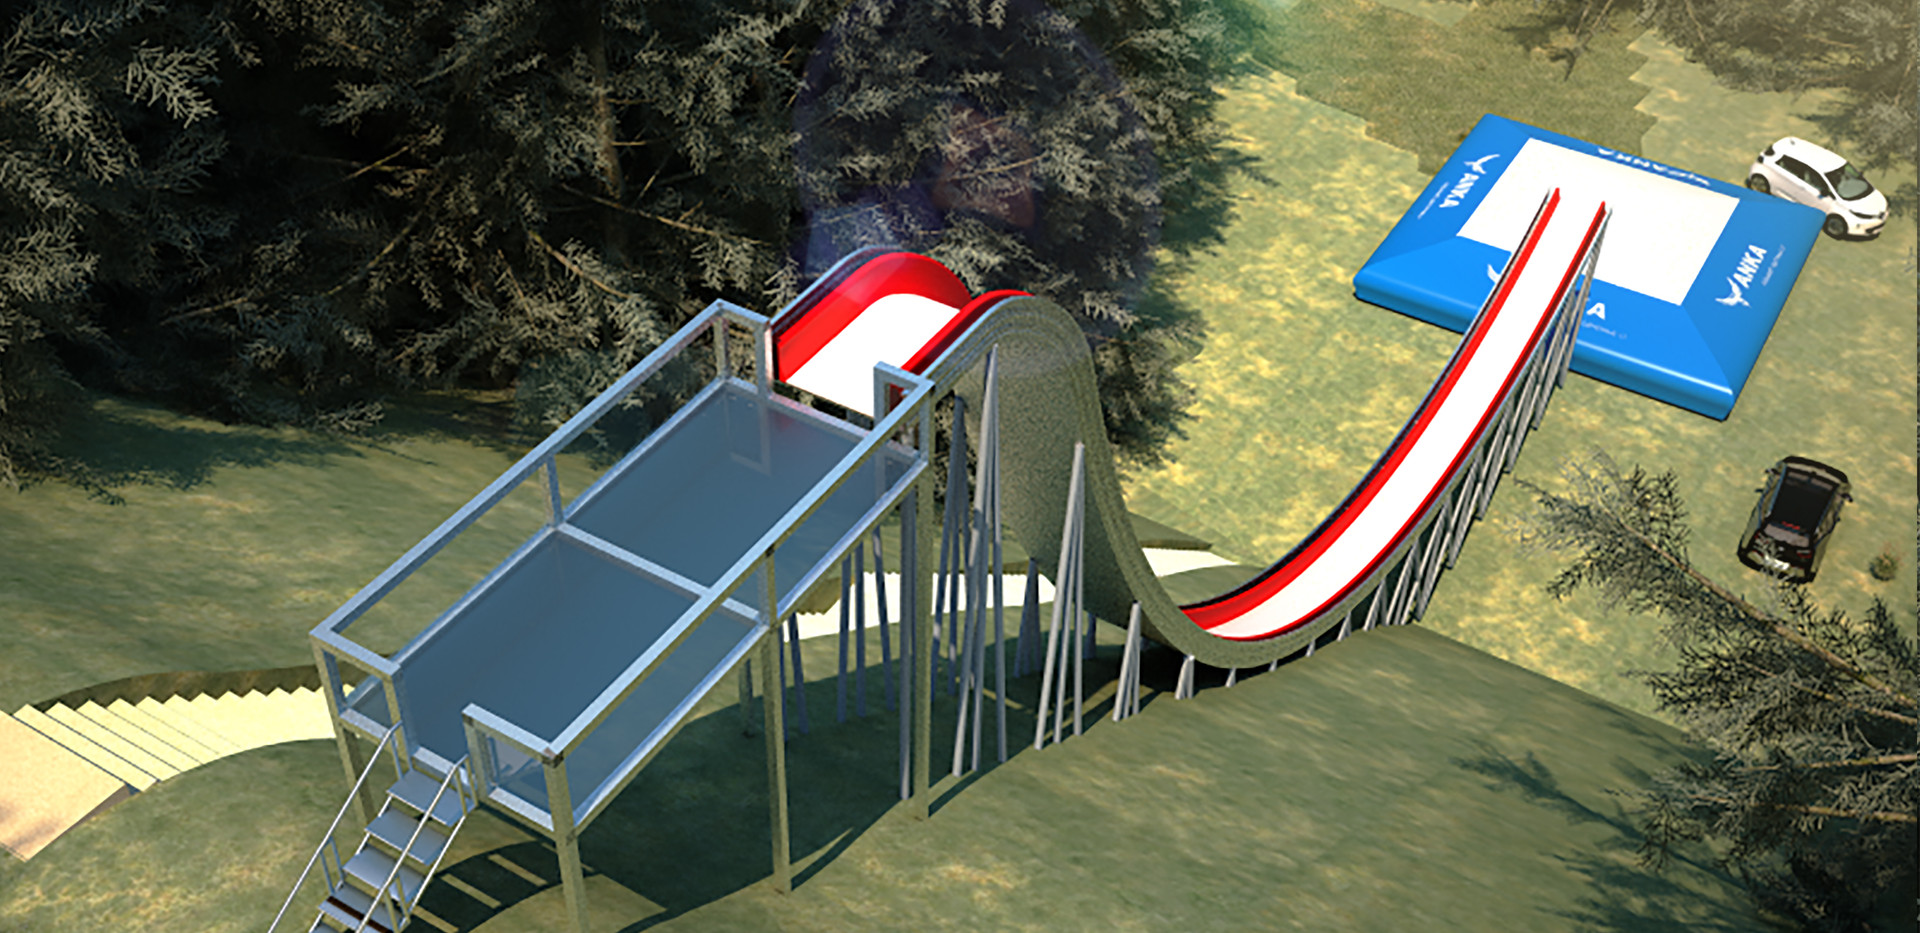 tubbing slide2